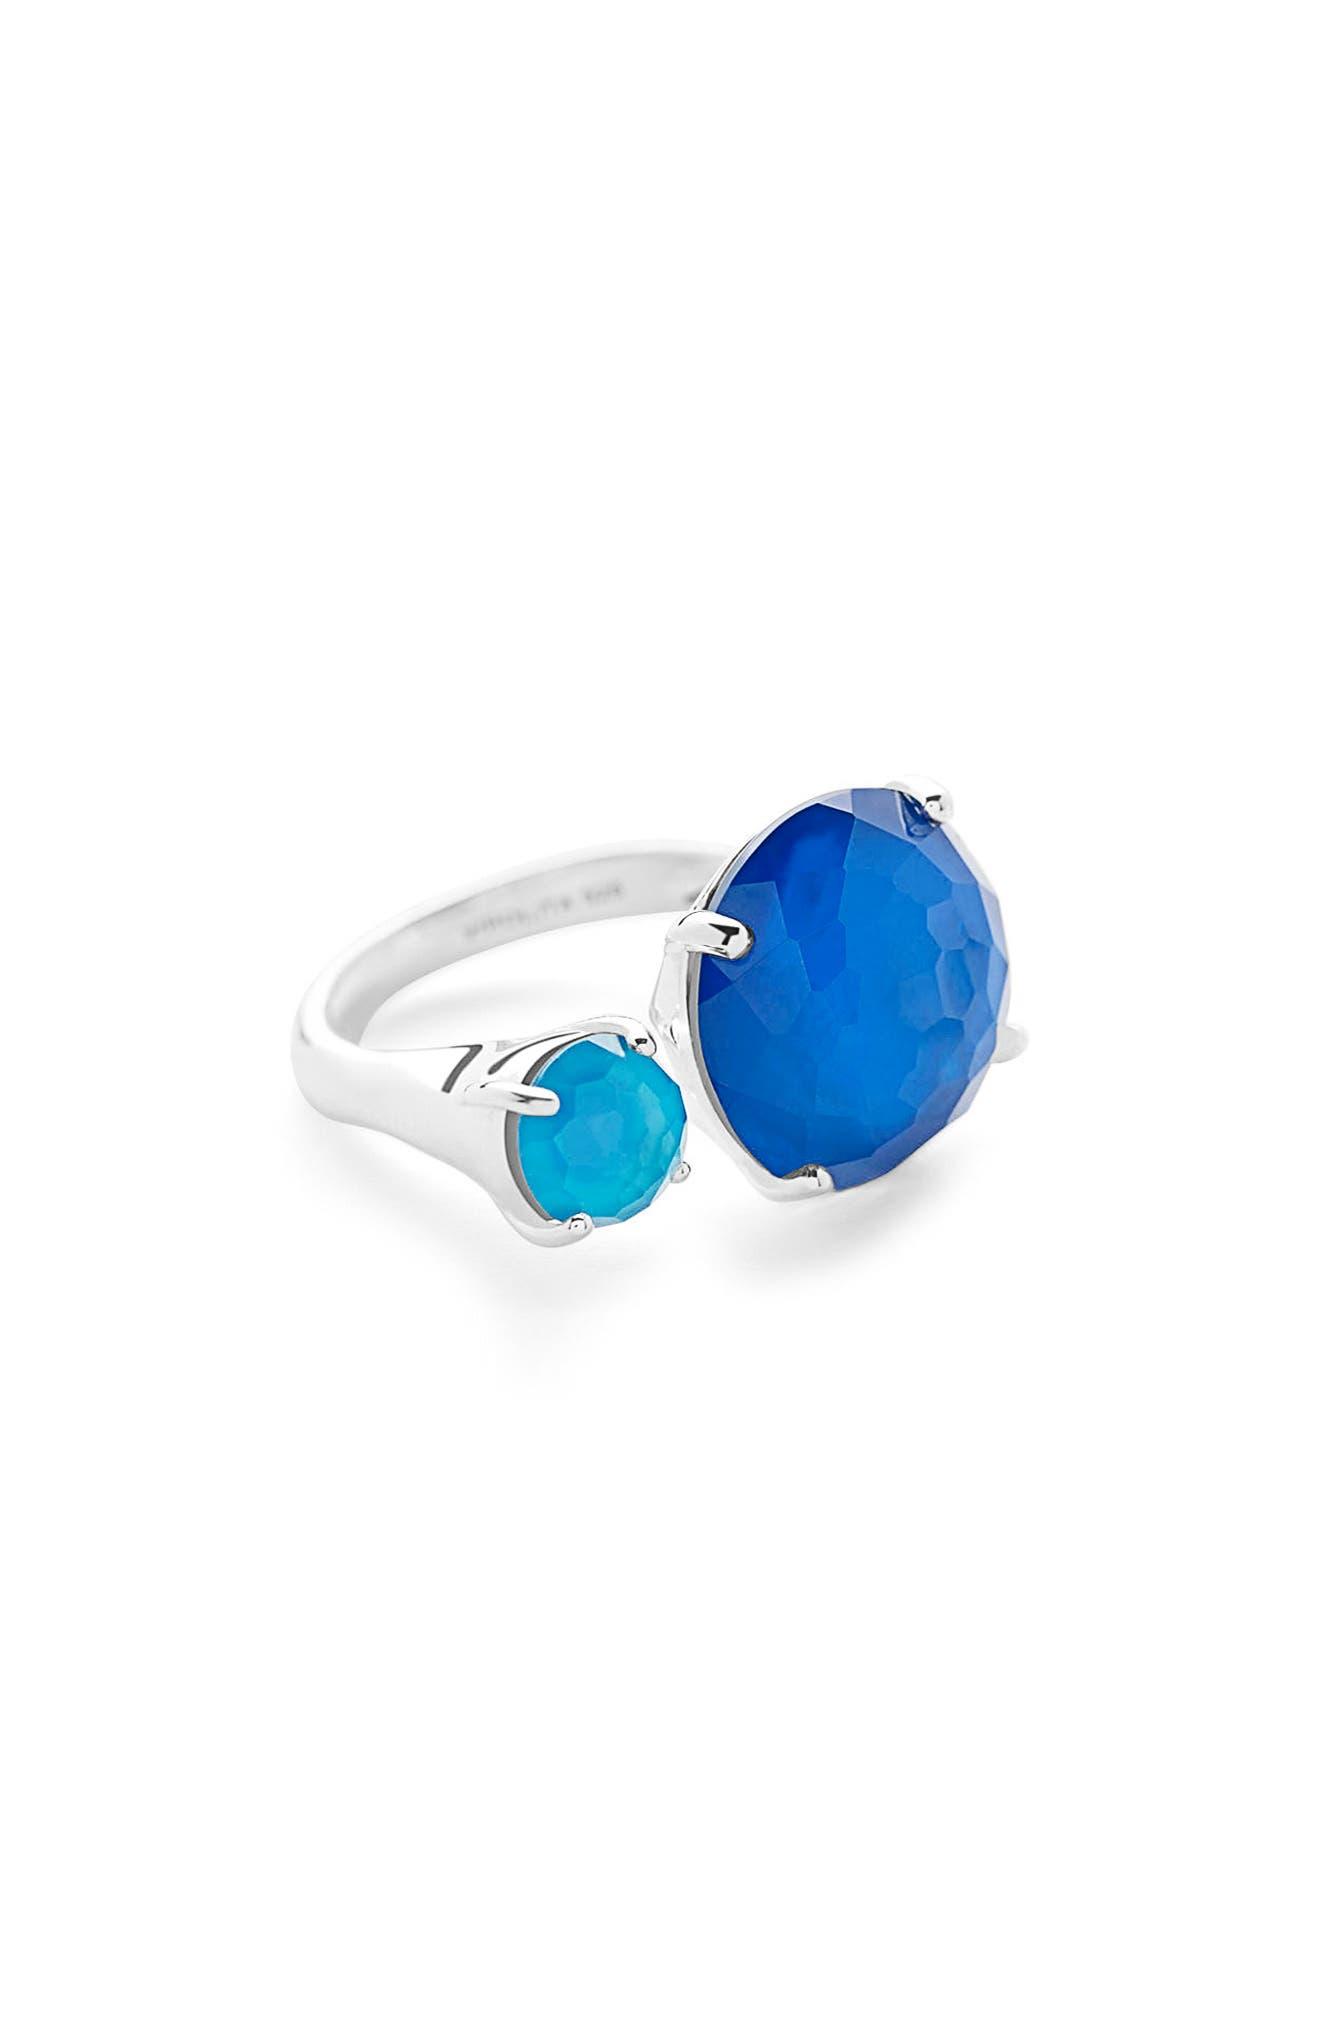 Wonderland Stone Ring,                         Main,                         color, Blue